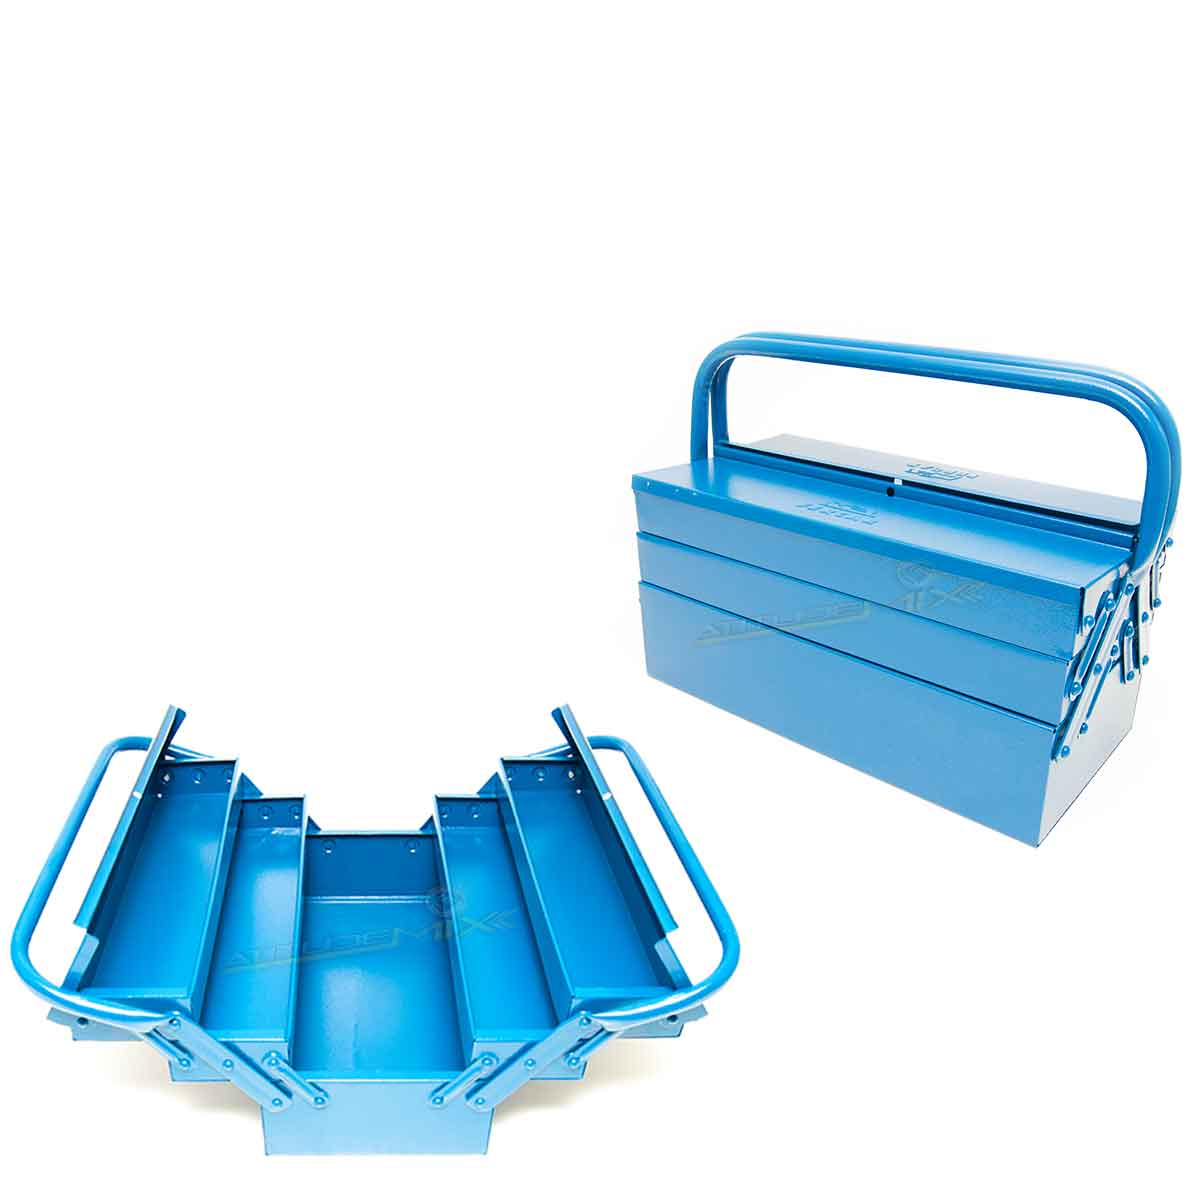 Caixa Sanfonada Azul 5 Gavetas Fercar